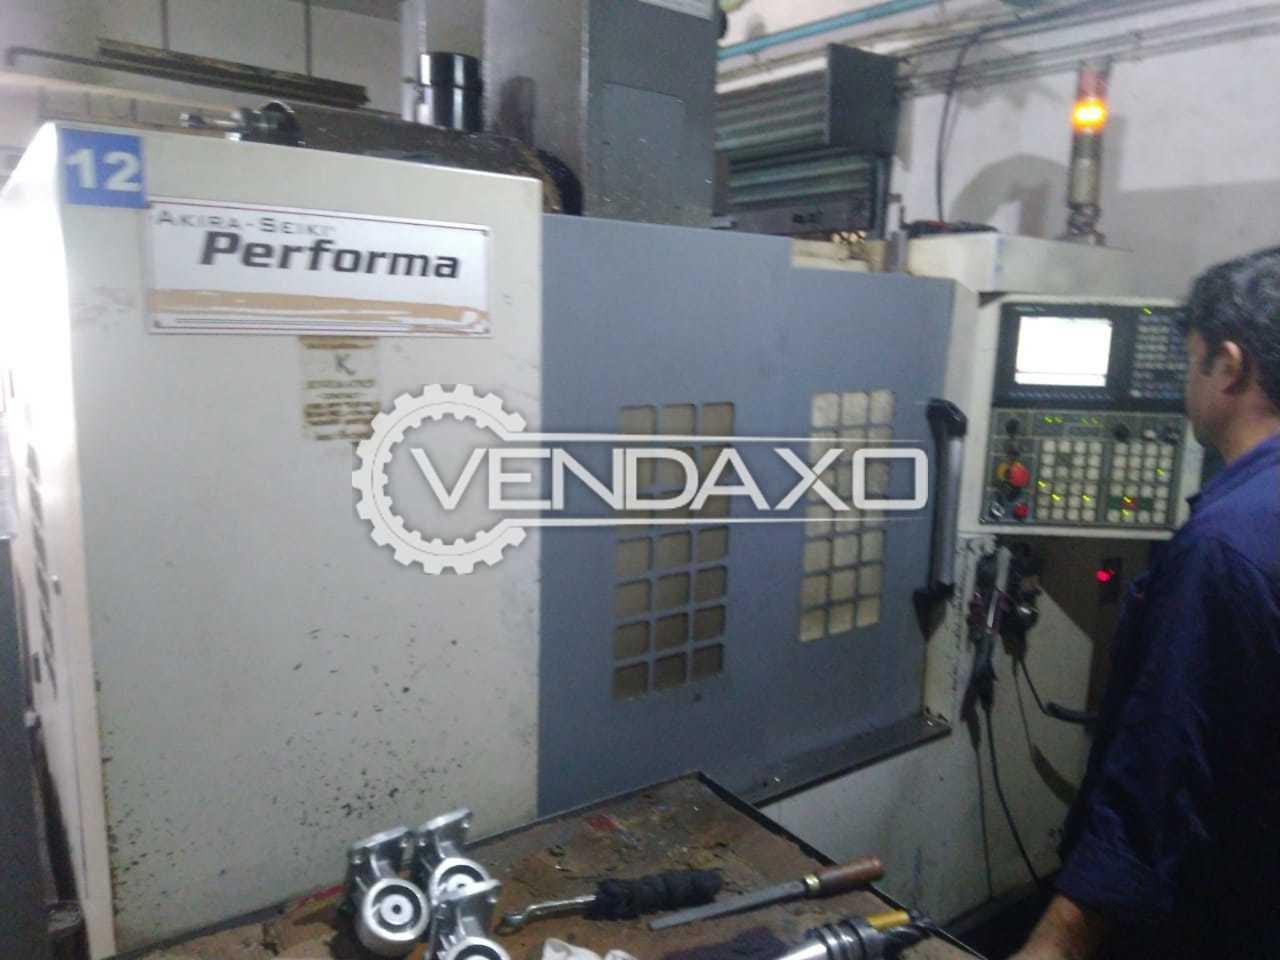 Akira Seiki Performa CNC Vertical Machining Center VMC - Table Size - 1000 X 500 mm